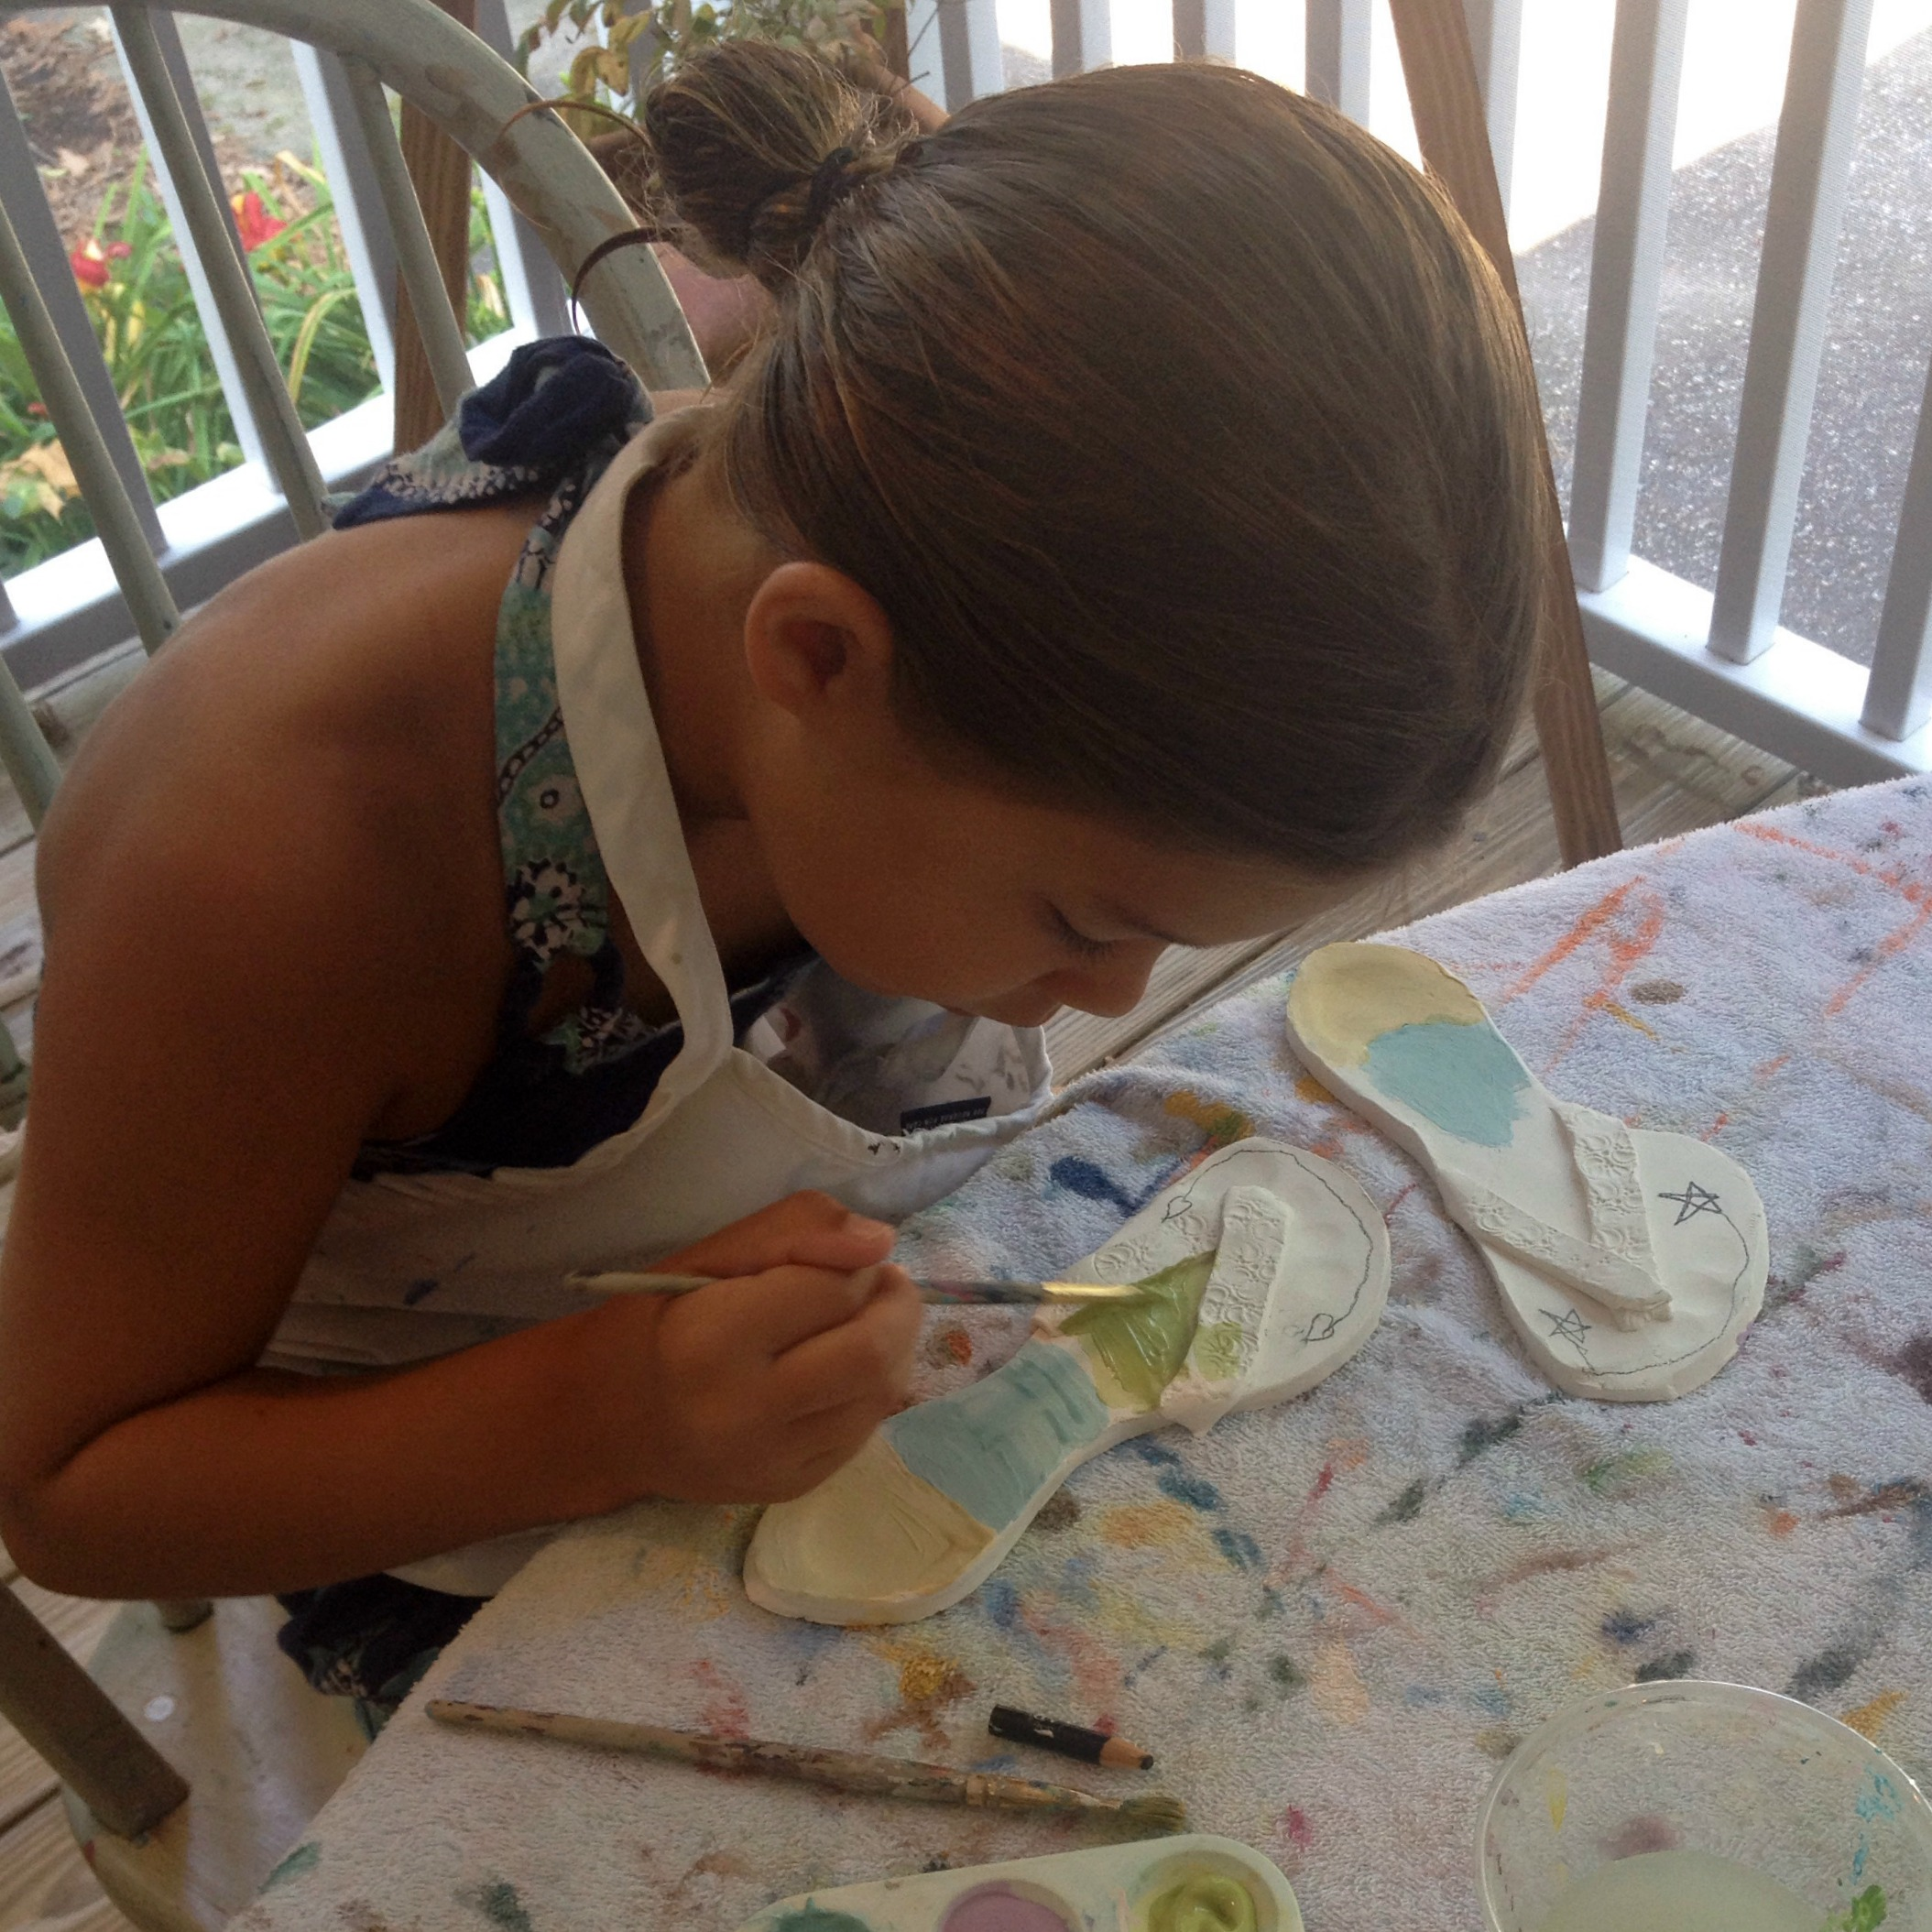 painting clay flipflops.jpg